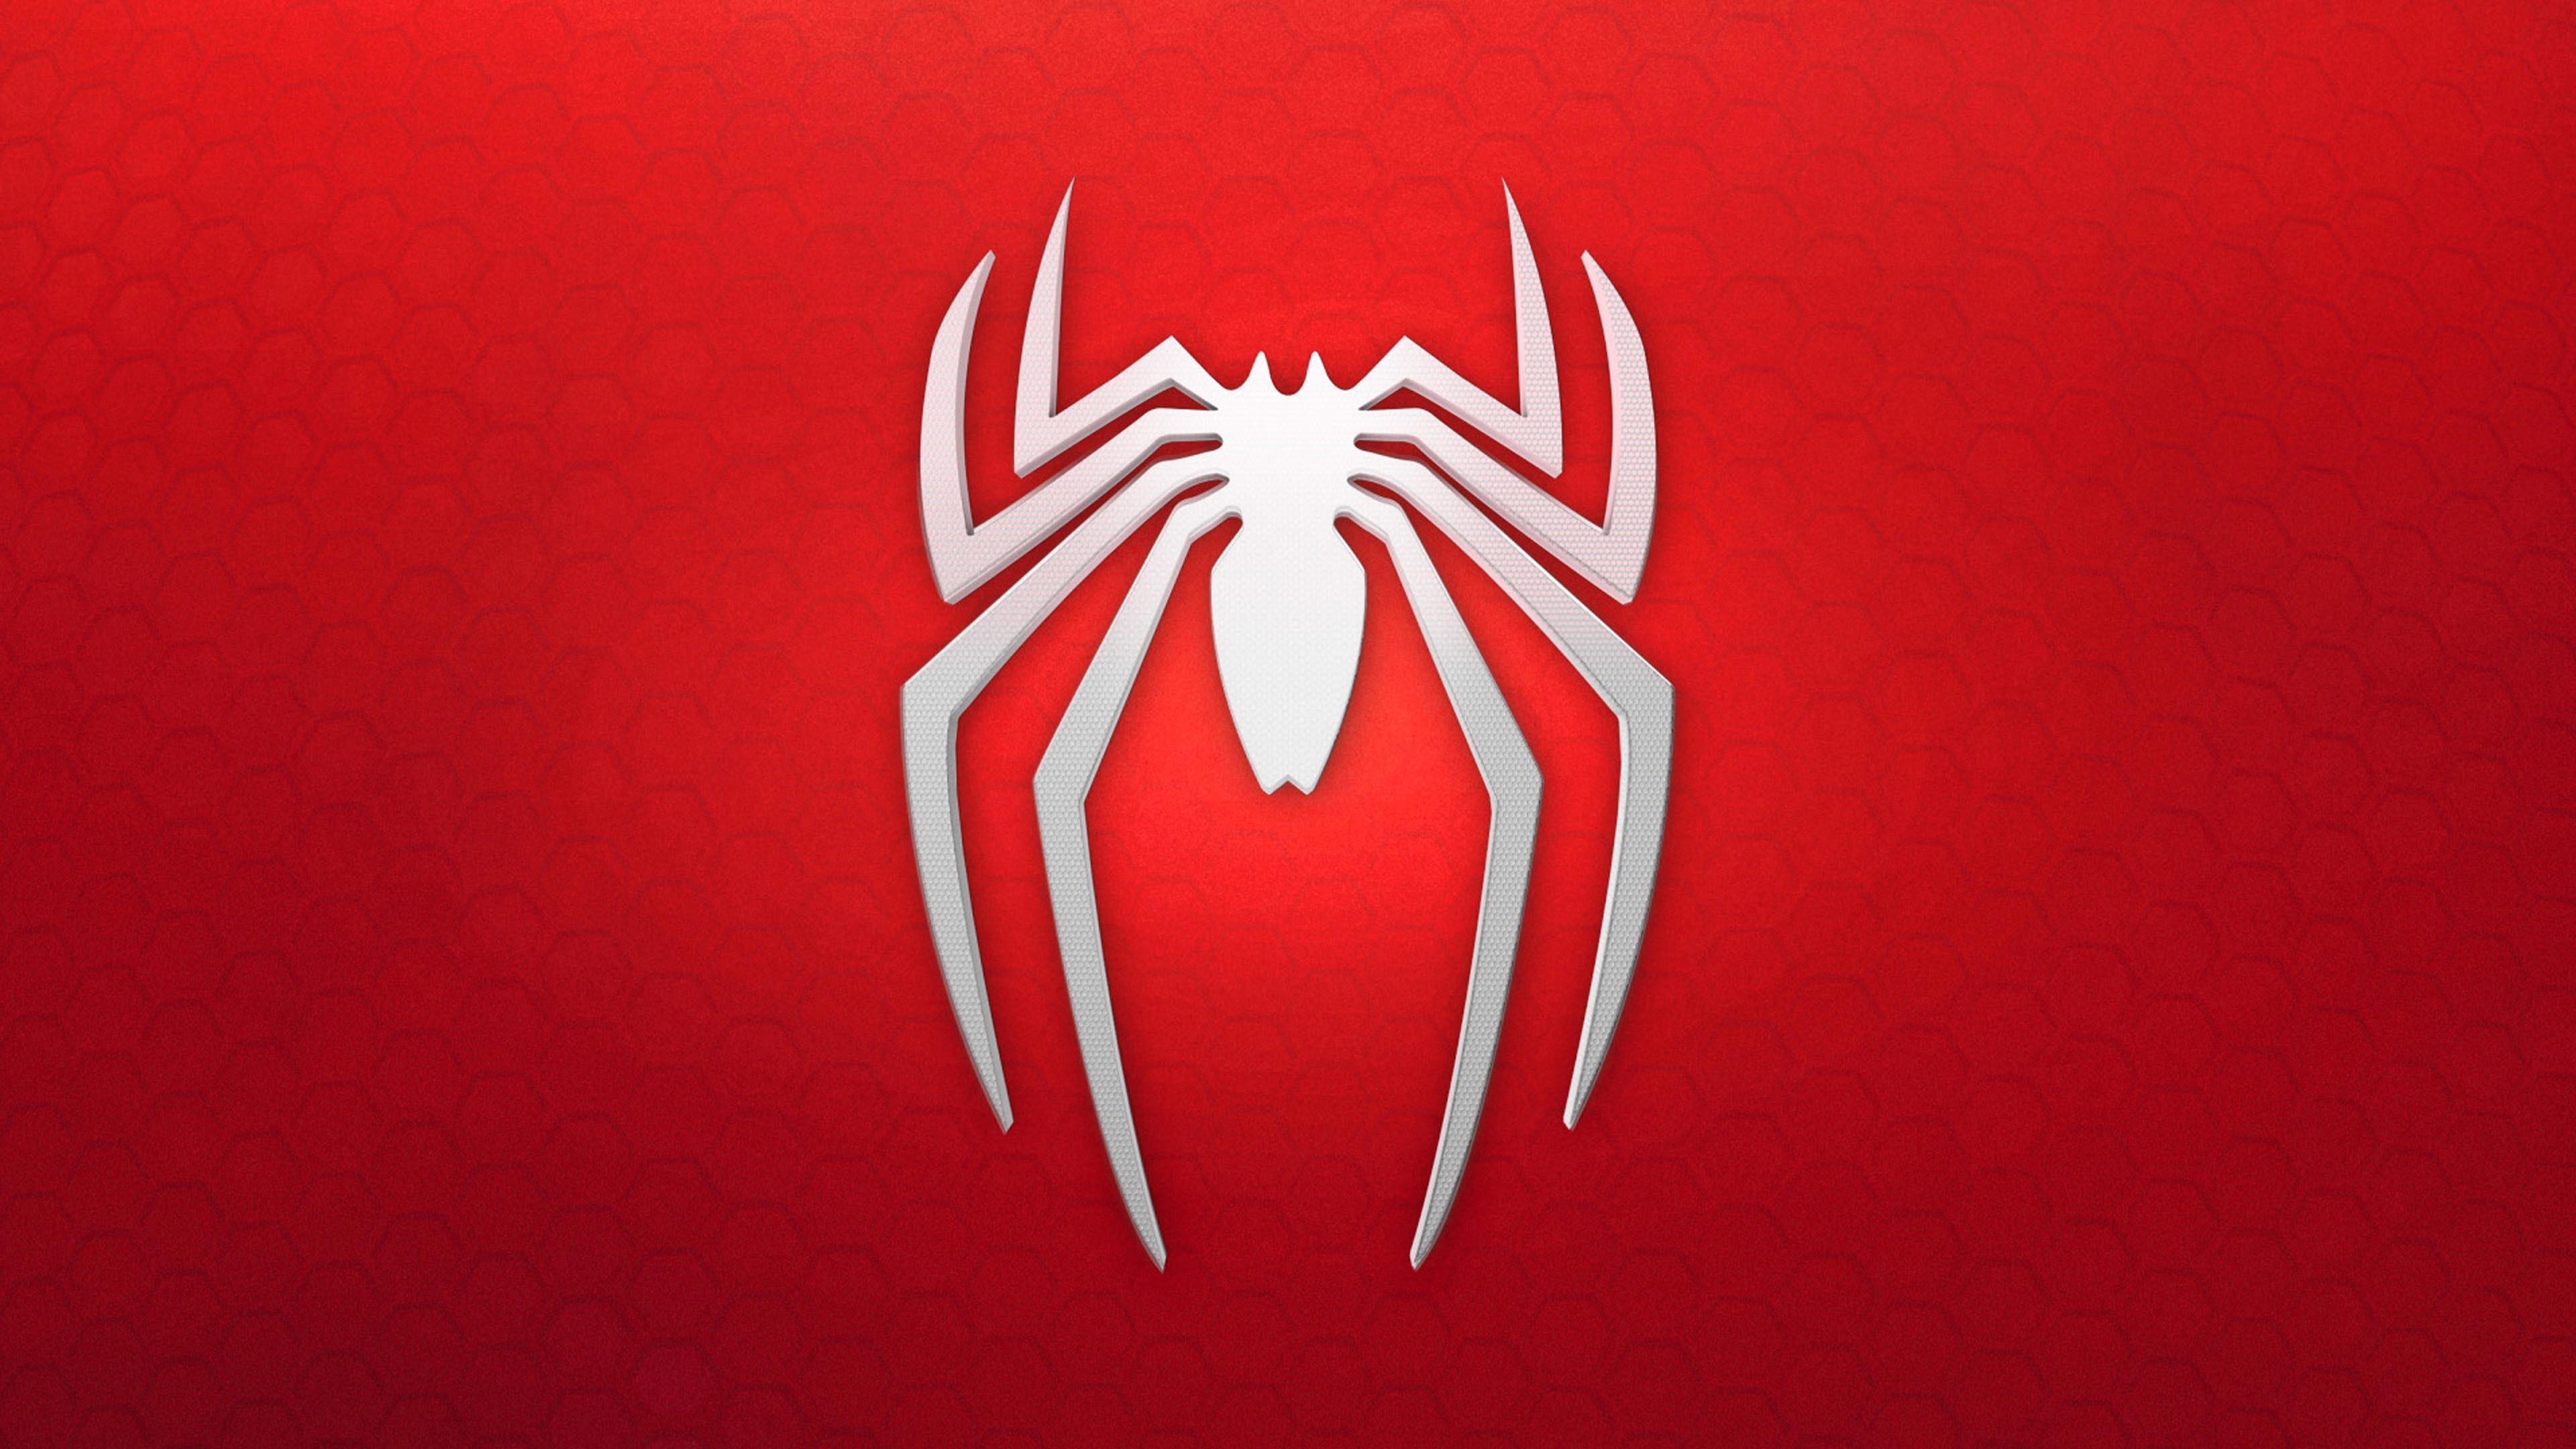 4K Spiderman Wallpaper (55+ images)